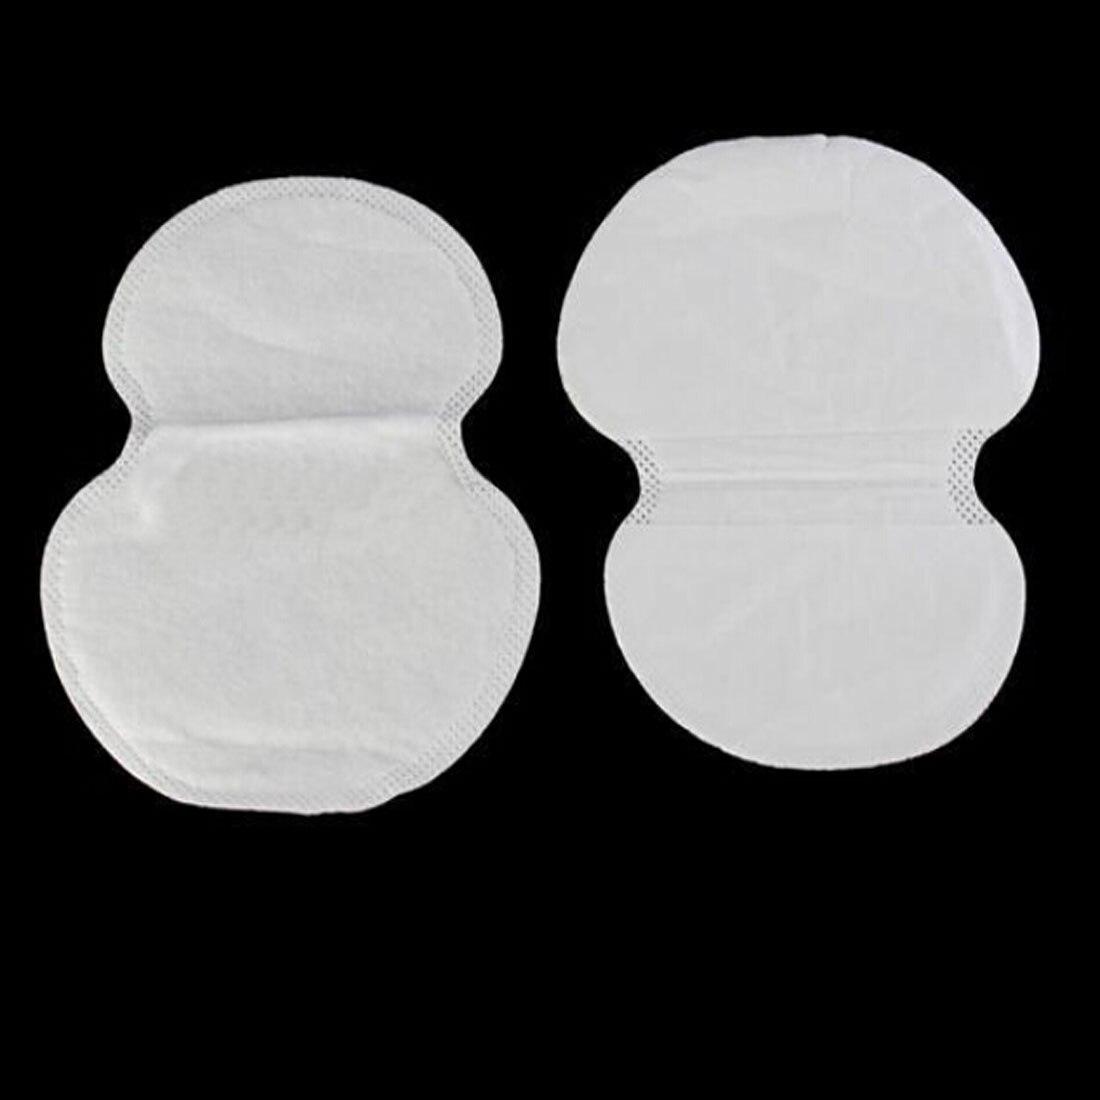 50Pcs Underarm Dress Clothing Armpit care sweat scent perspiration Pad shield Absorbing deodorant Antiperspirant